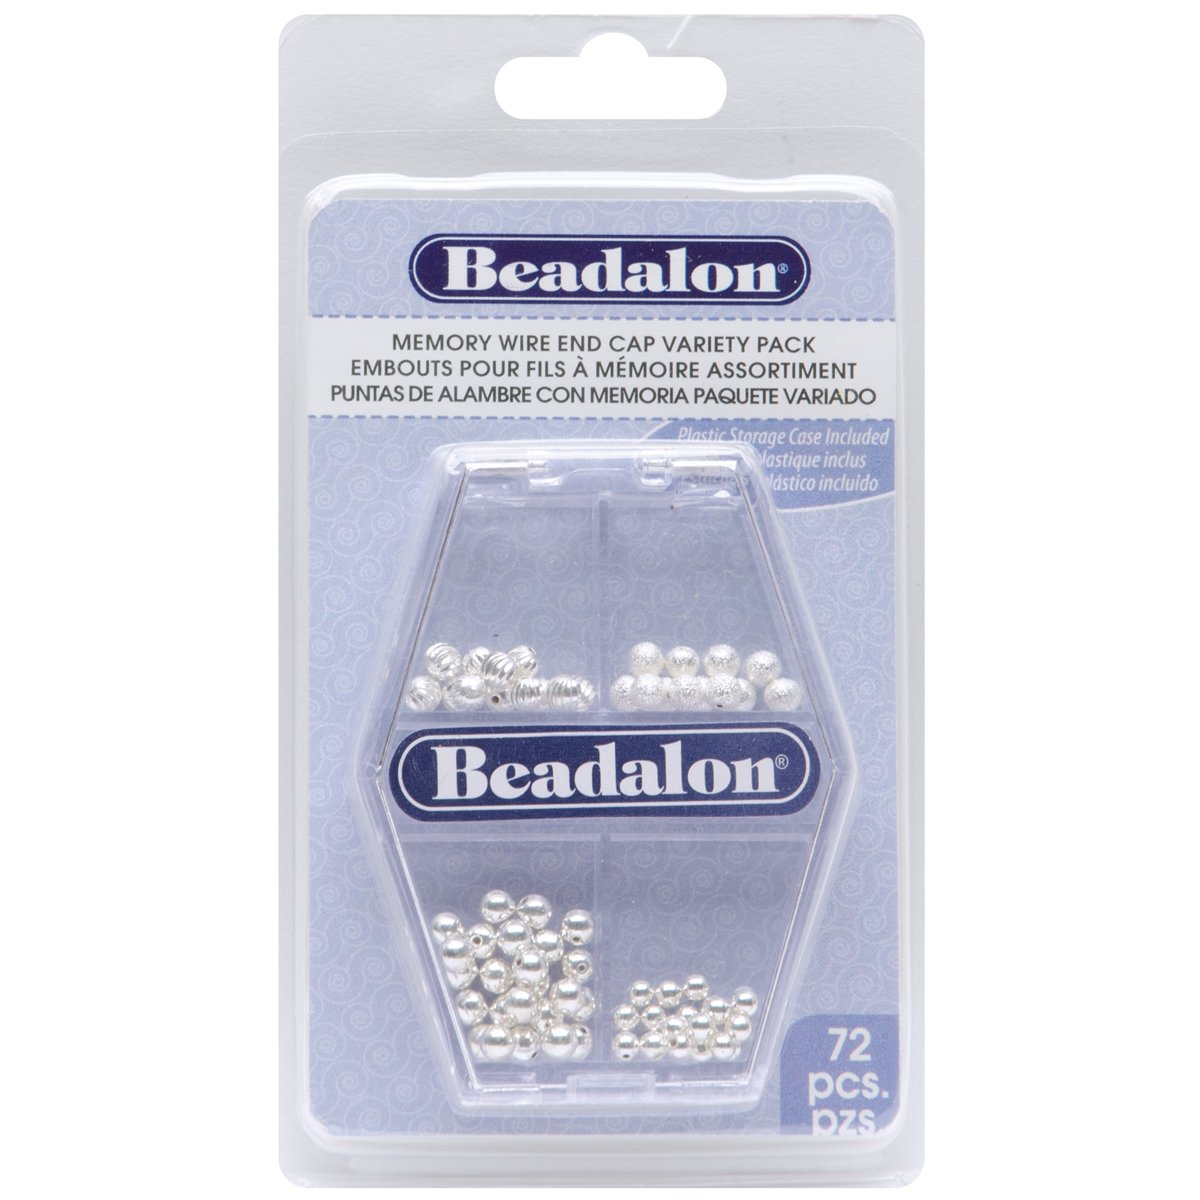 Amazon.com: Beadalon 317B-310 Memory Wire End Cap, Variety Pack, 72 ...